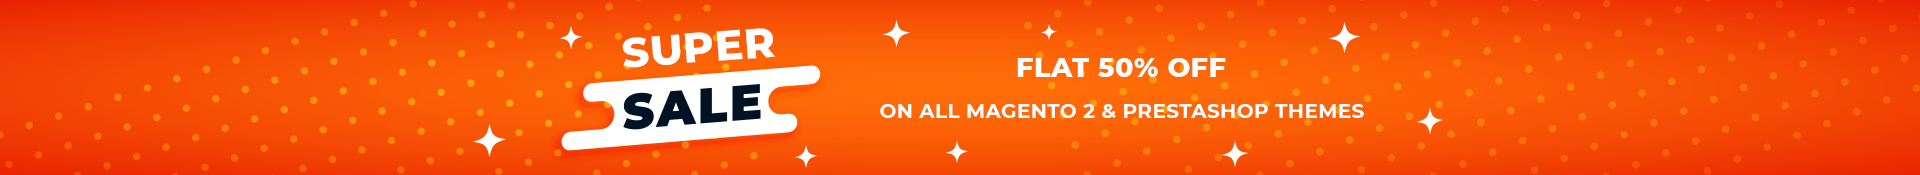 HiddenTechies - Magento 2 Theme 50% Off